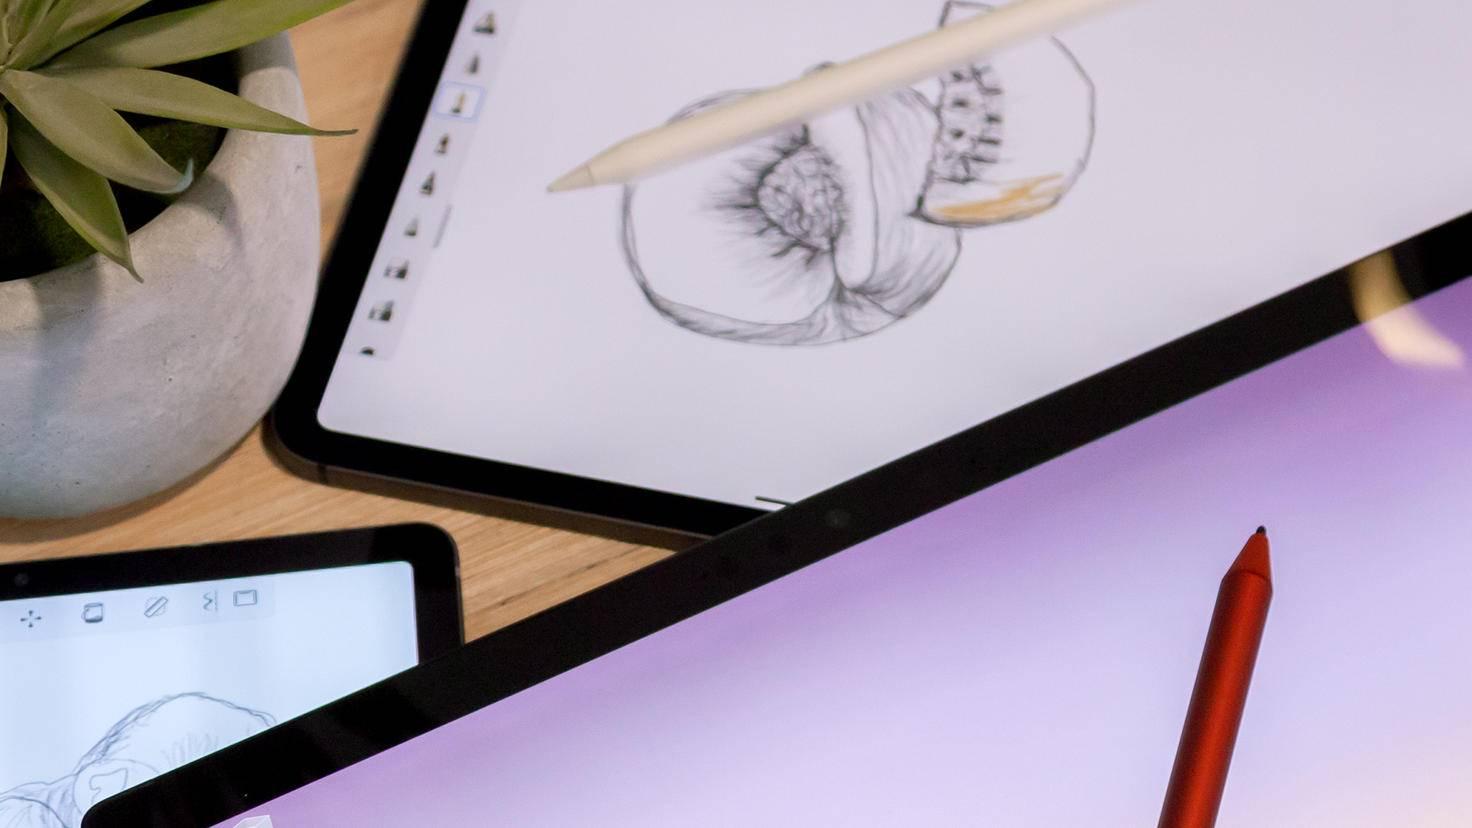 surface-pen-apple-pencil